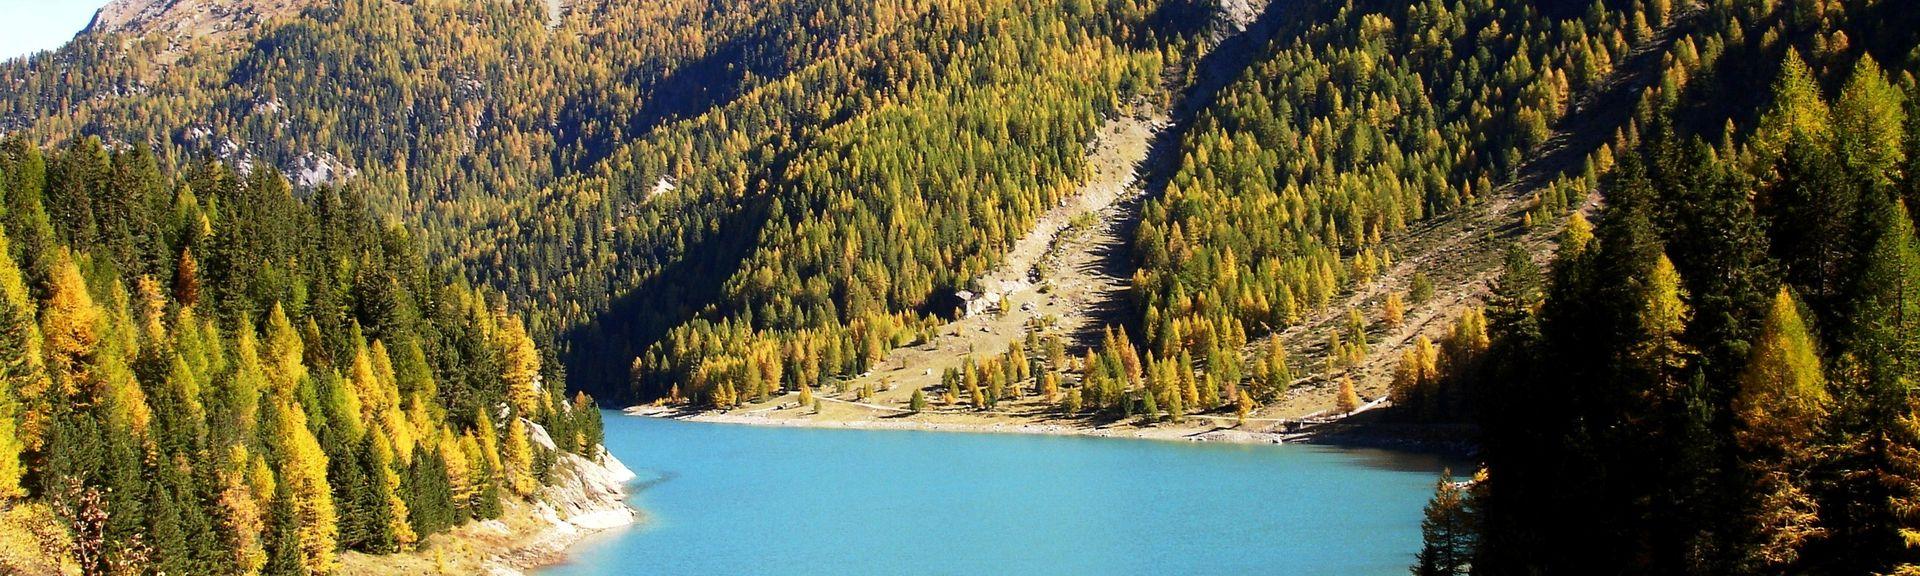 Sluderno, Trentino-Zuid-Tirol, Italië